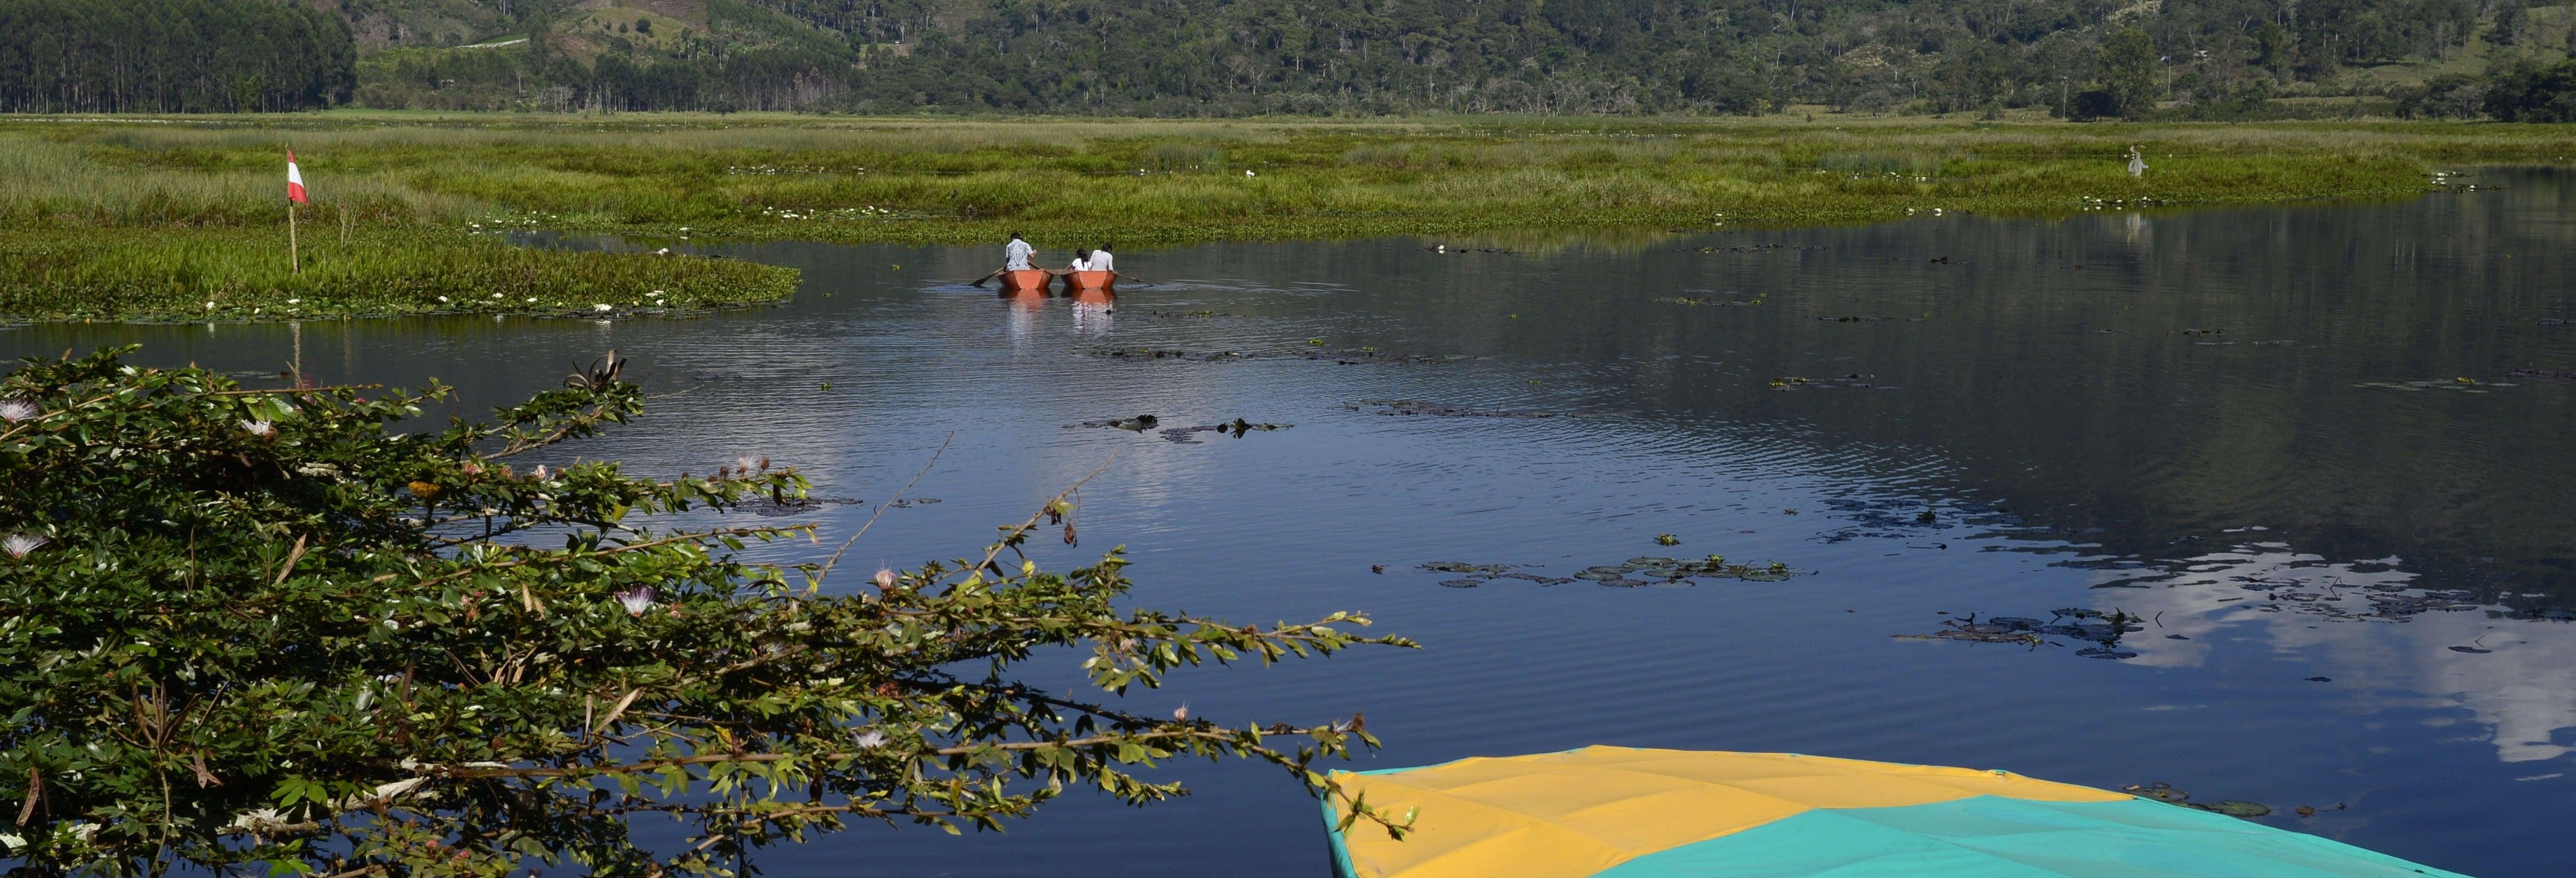 Excursão a Villa Rica e lagoa El Oconal